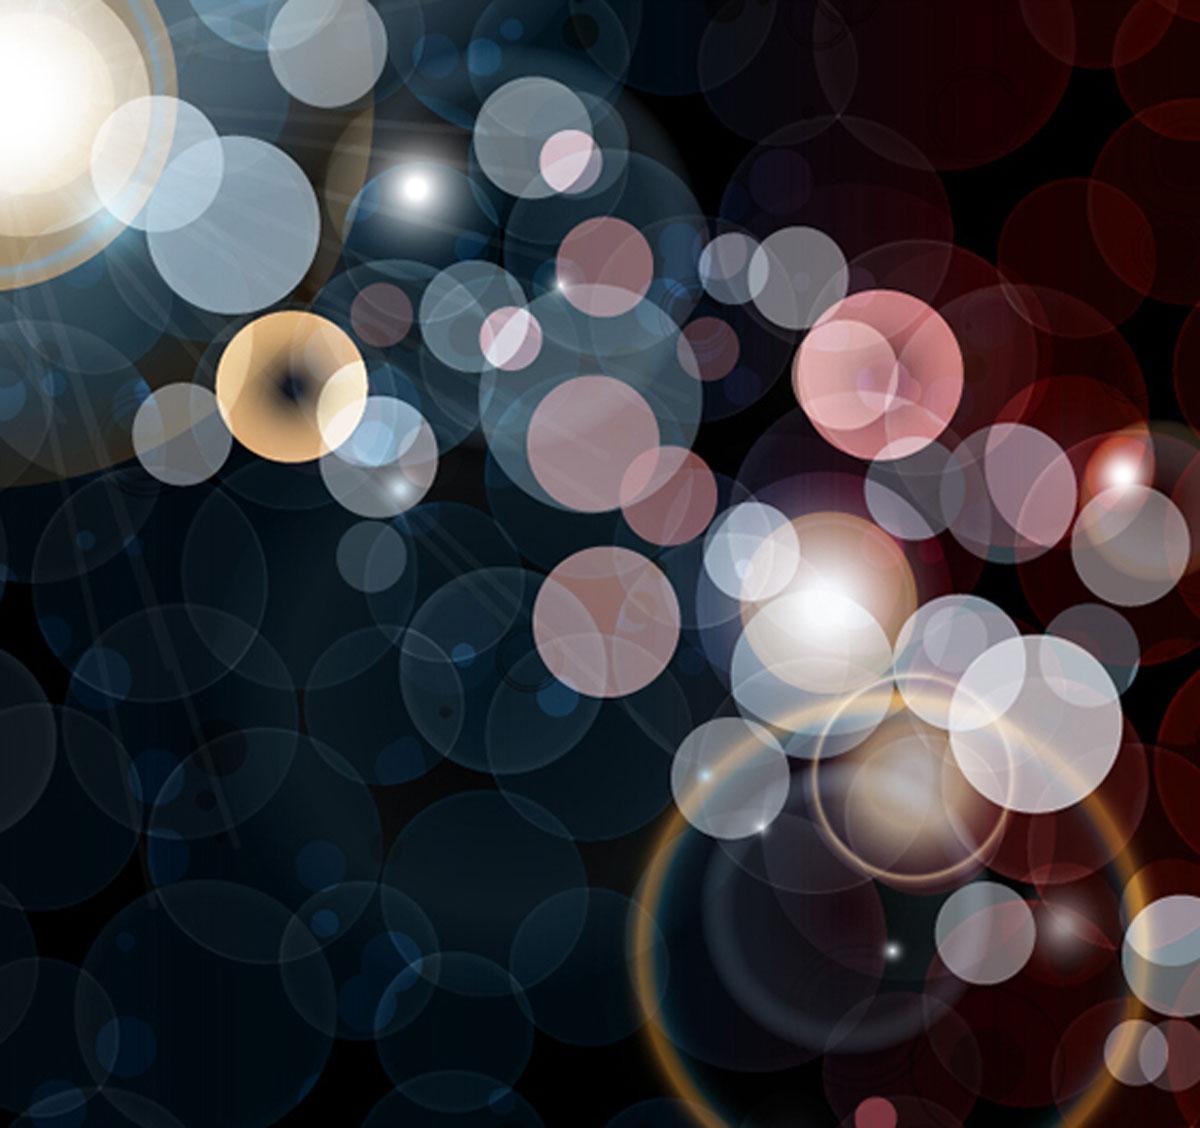 Bubbles of Light